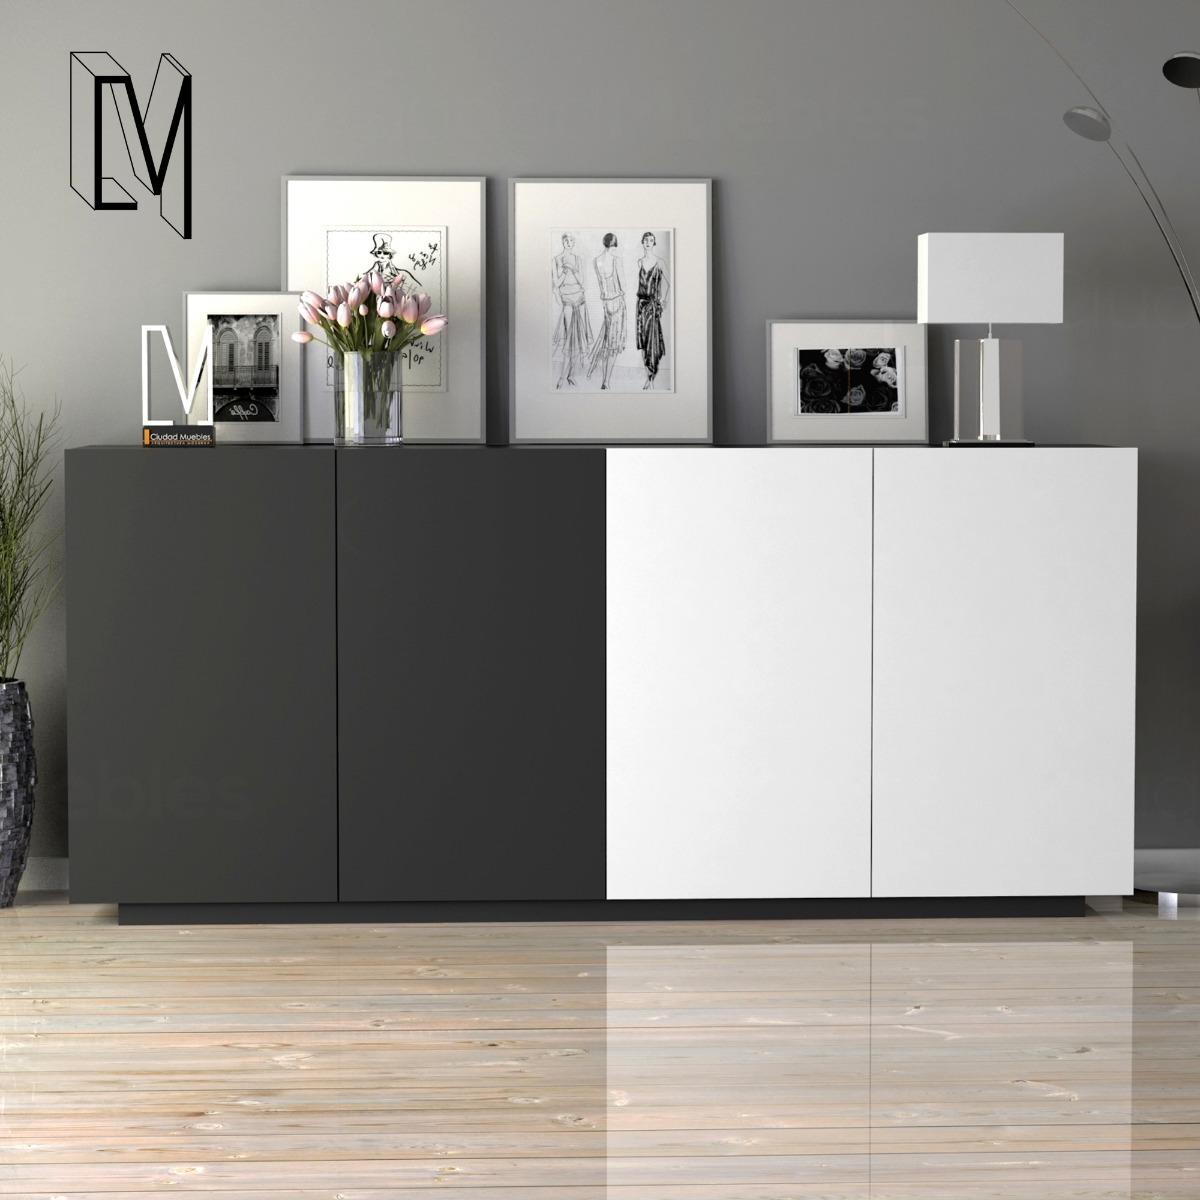 Modular Vajillero Mueble Comedor 180cm De Largo. Oferta!!! - $ 6.770 ...